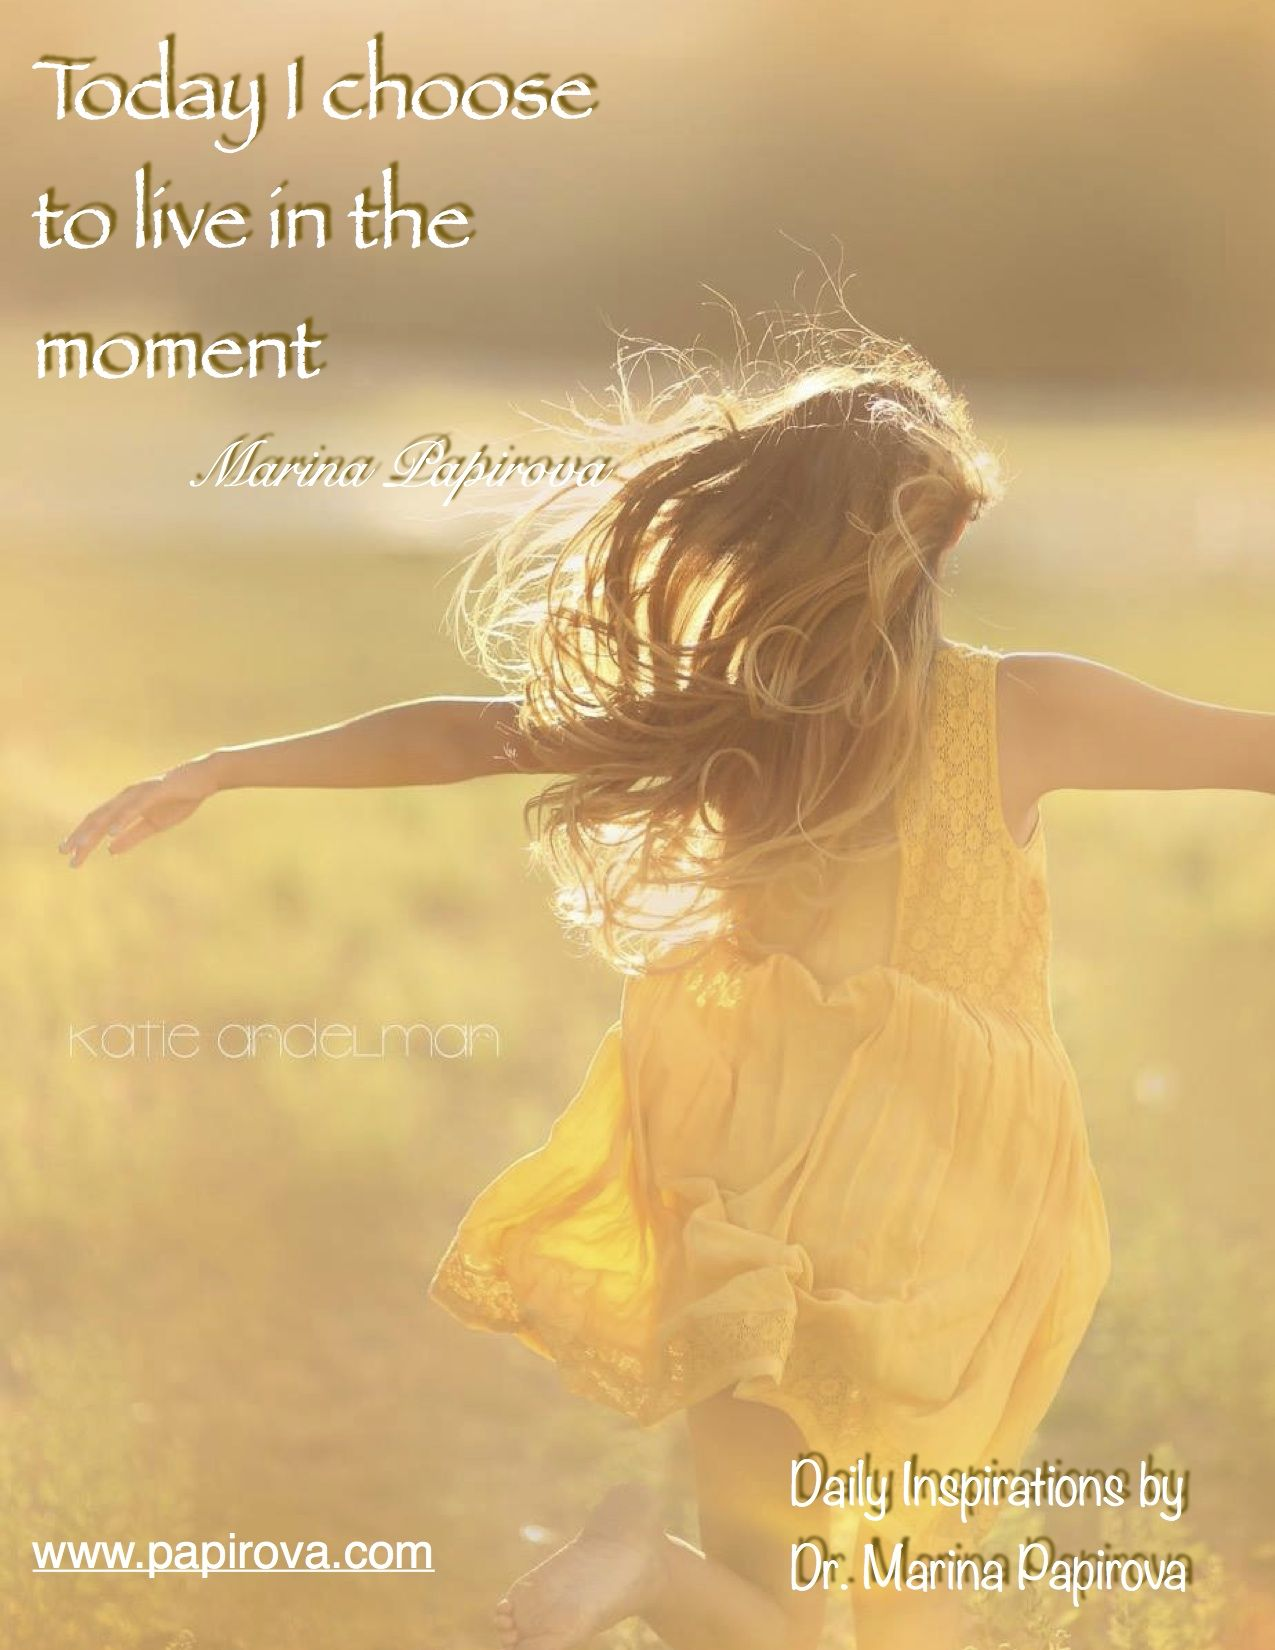 #beauty, #child, #girl, #quotes, #inspirations, #moment, #adventure, #life, #joy, #fun, #smile, #enjoy, #happiness, #consciousness, #vision, #psychotherapy, #Marina Papirova, #Dr. Papirova